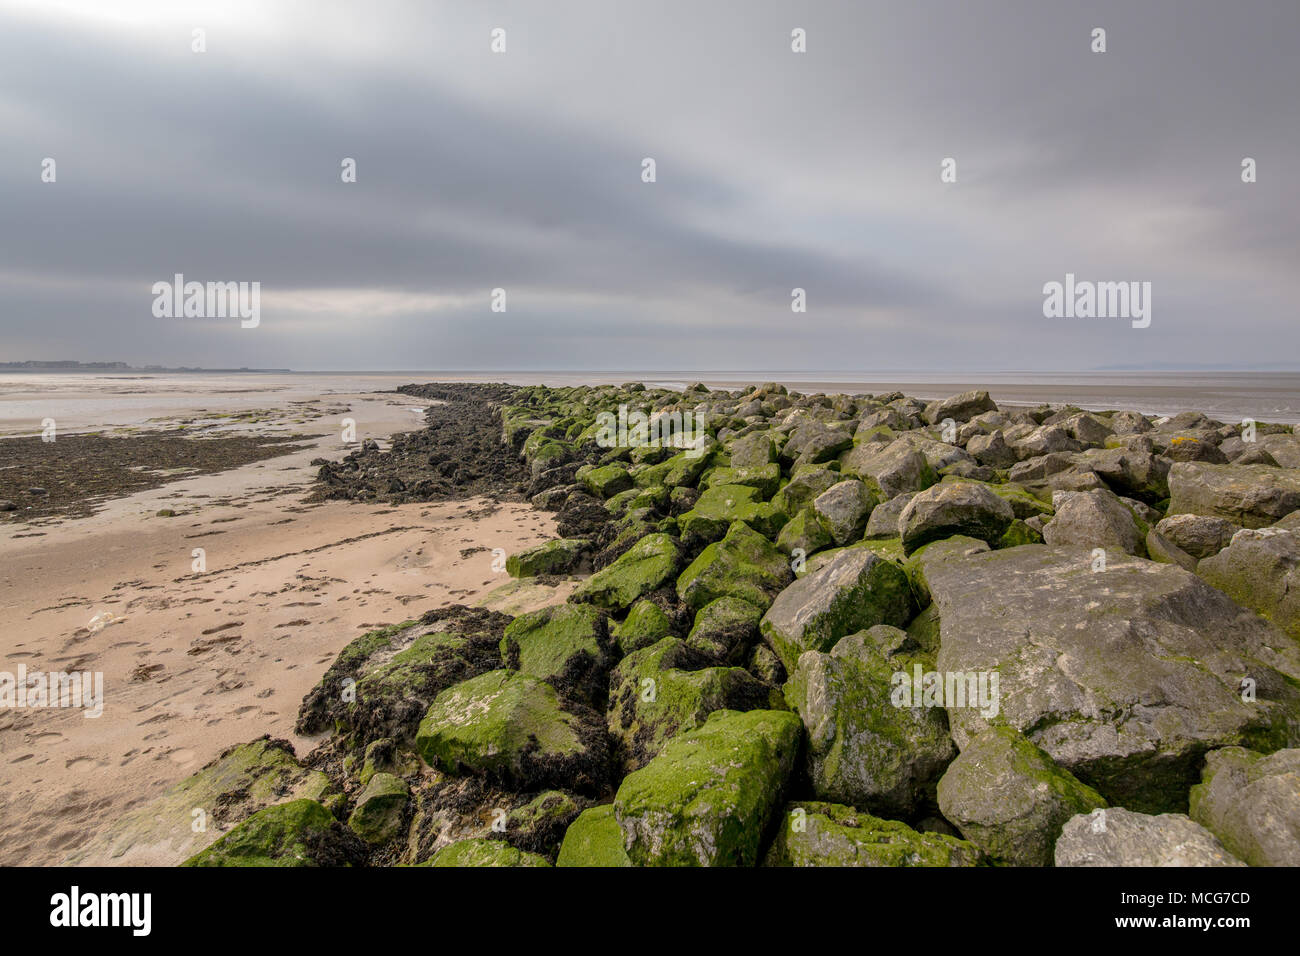 Rocky Moos bedeckt Wellenbrecher am Strand von Morecambe, England, UK. Am 11. April 2018 berücksichtigt. Stockbild